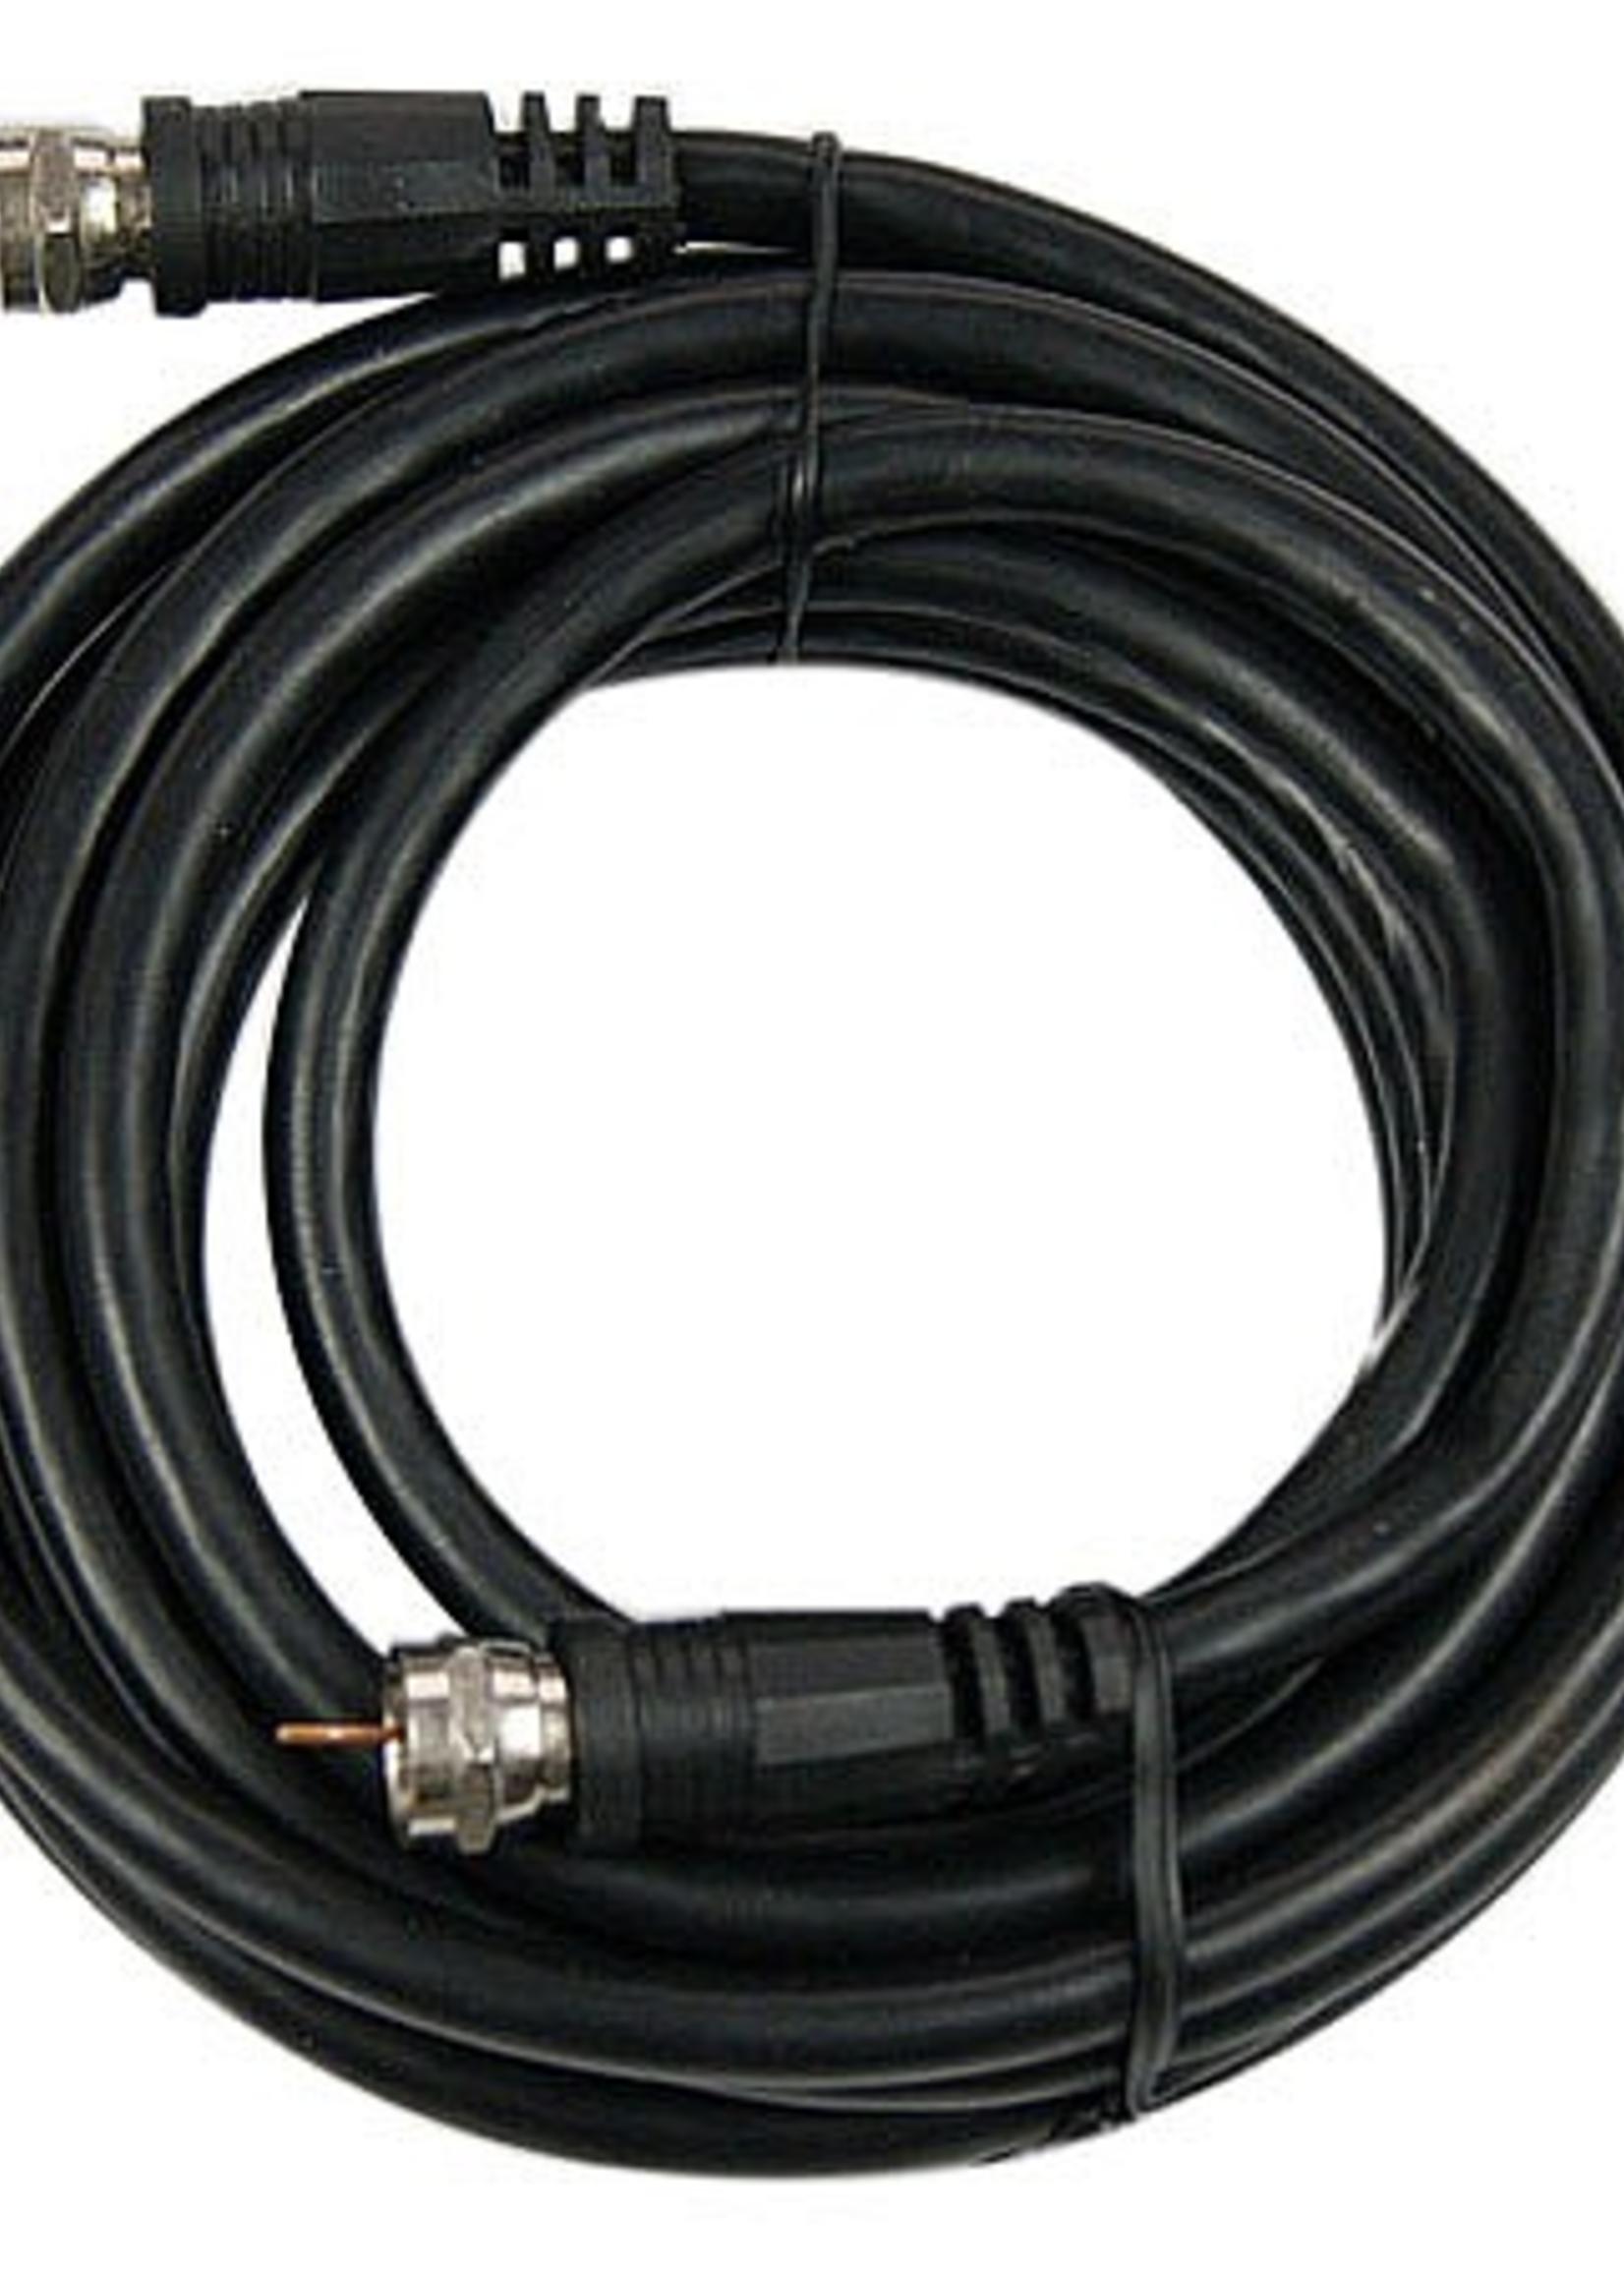 CableXpert RG-6 Coaxiale antennekabel met F-connectors, 1,5 m